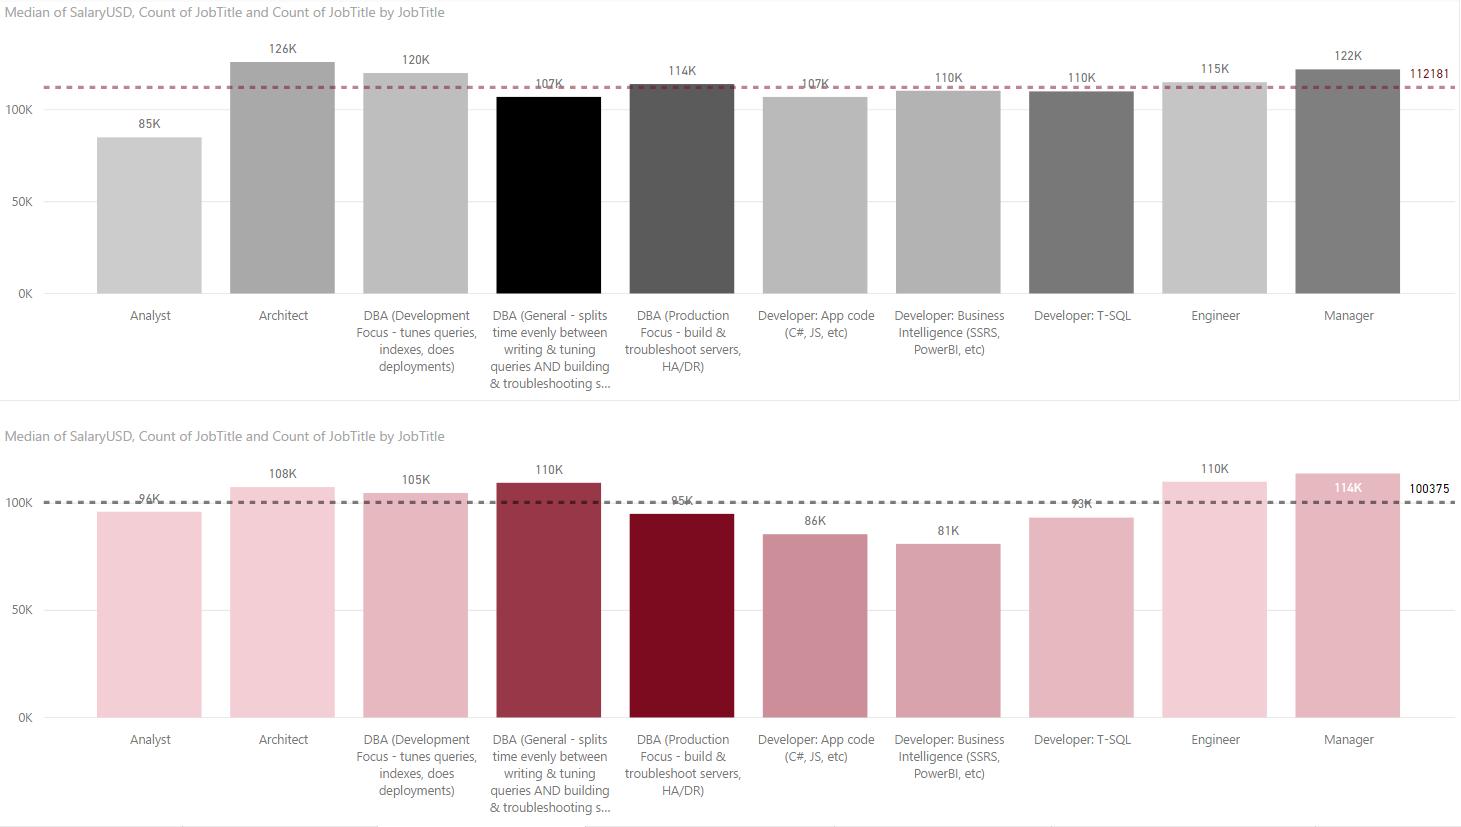 Median Salaries for Senior (Male $112,181 vs. Female $100,375)